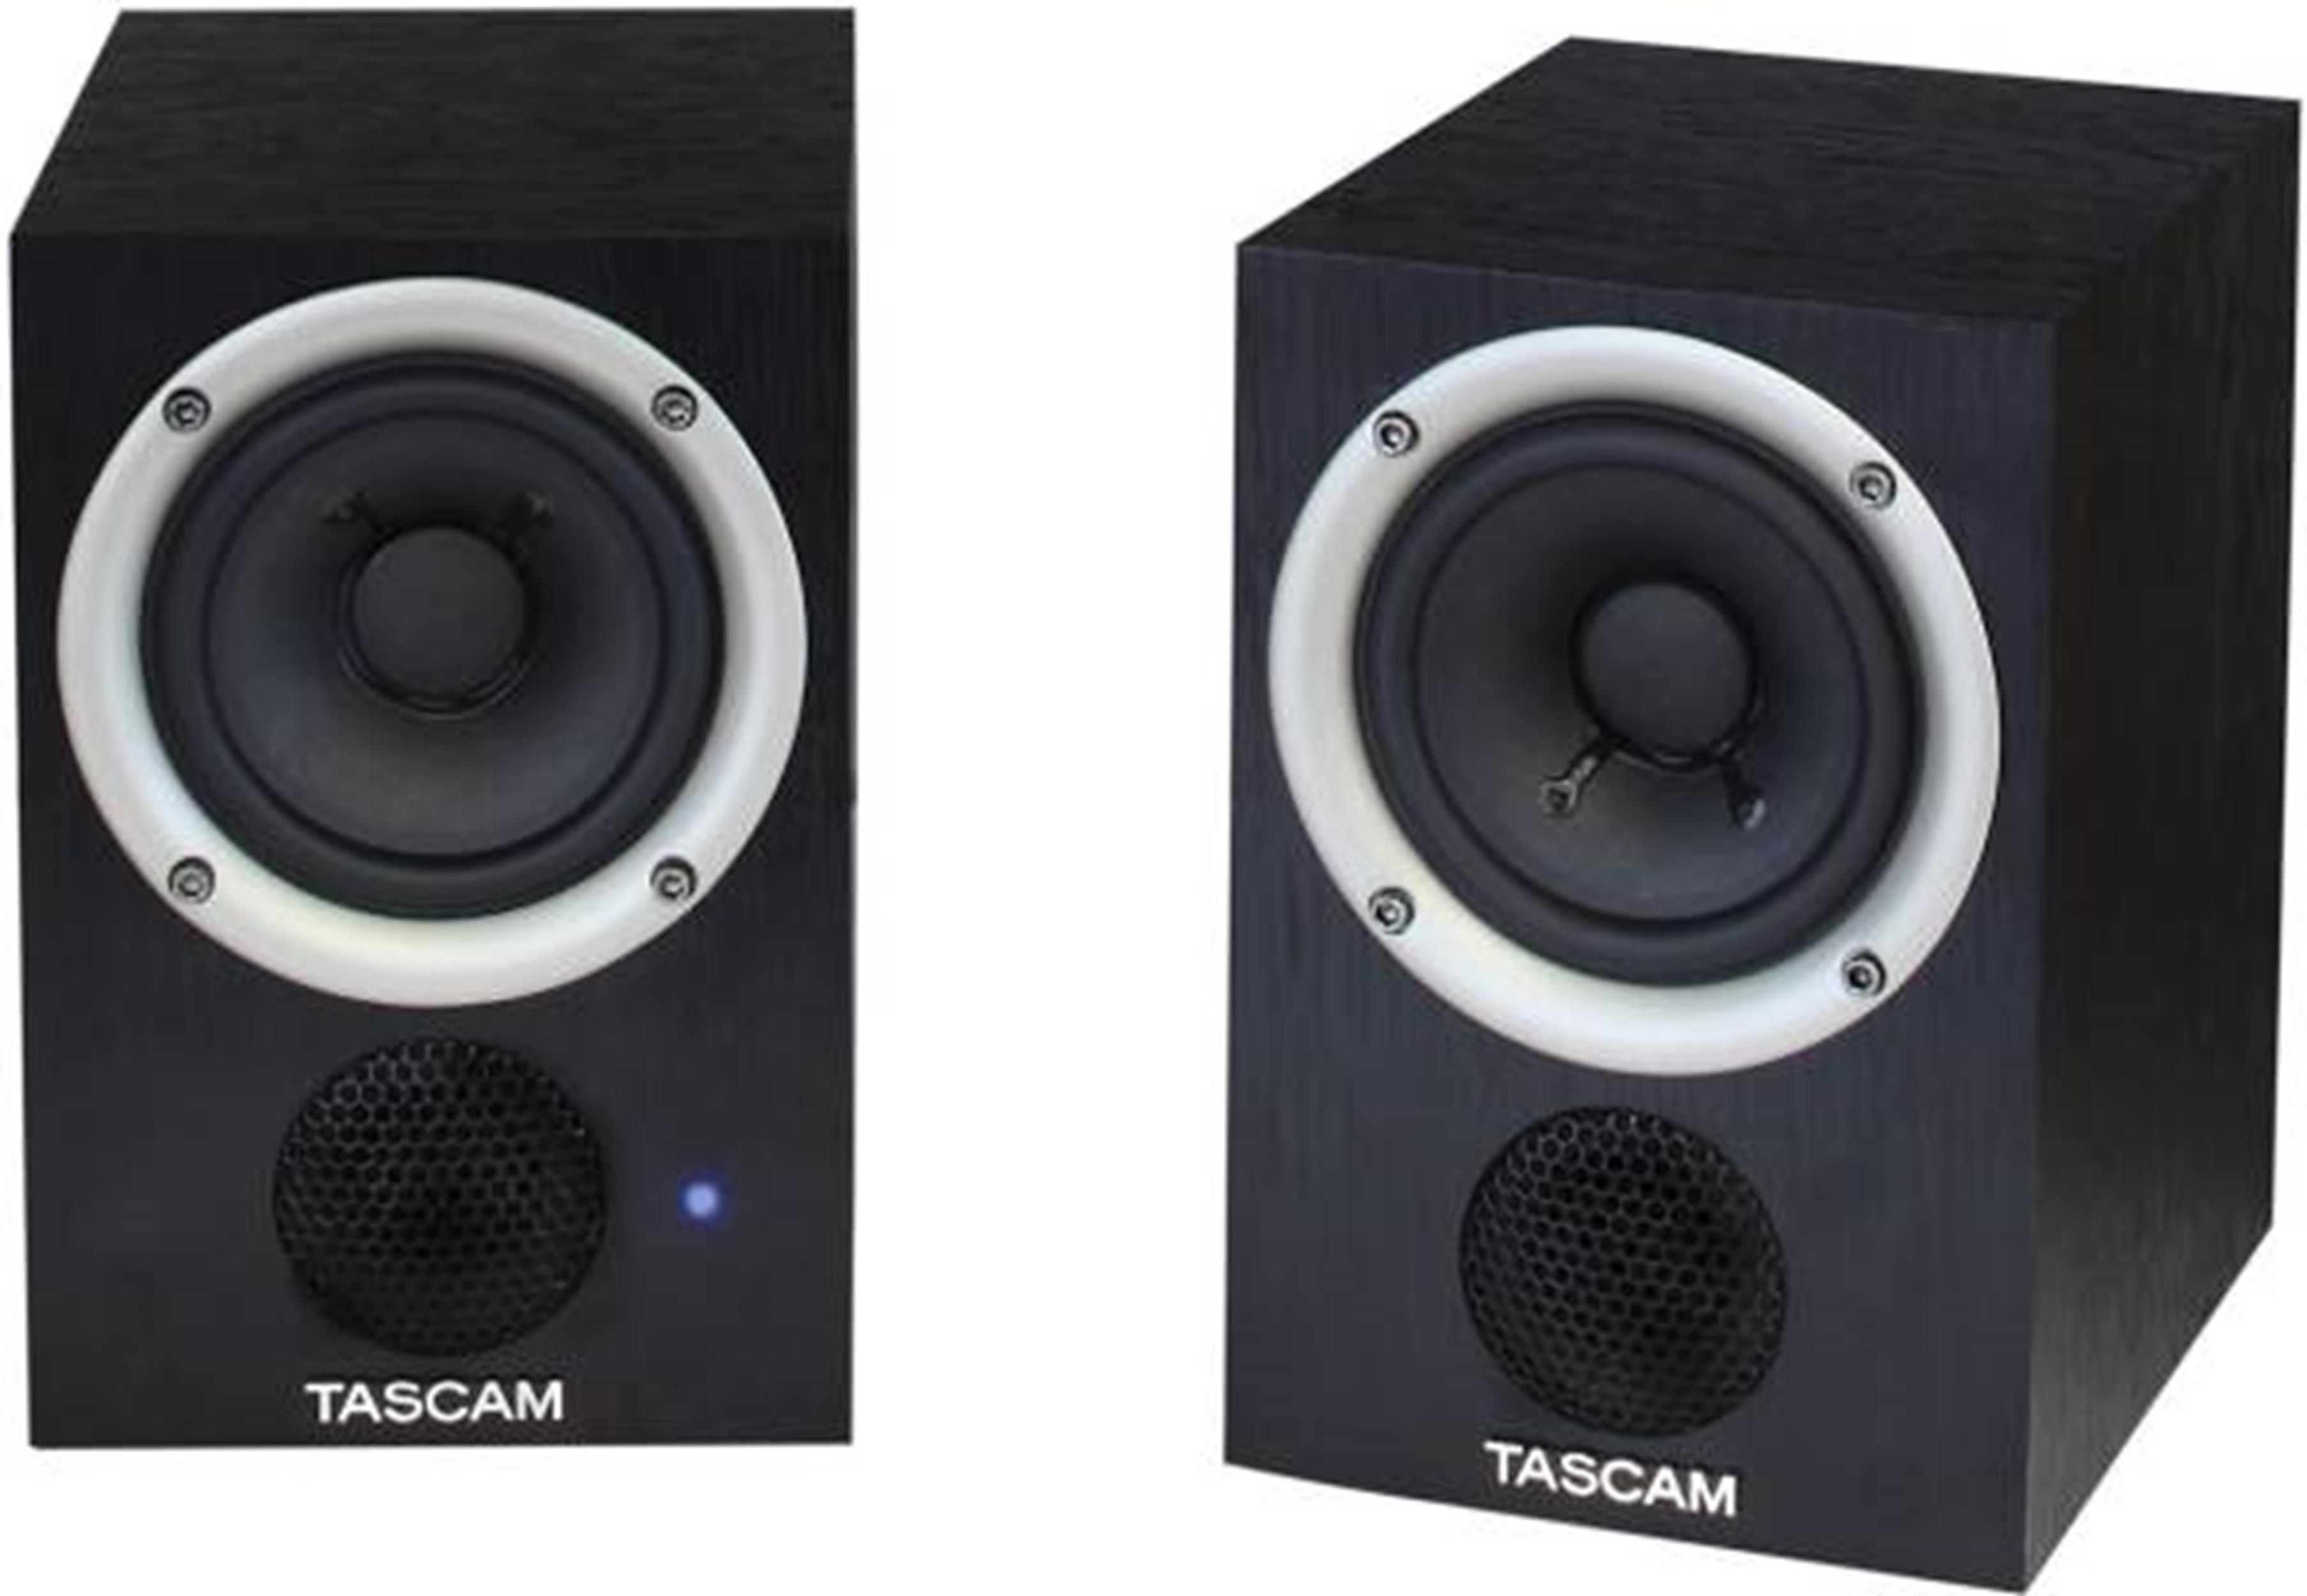 TASCAM TASCAM VL-S3 VLS3 COPPIA MONITOR